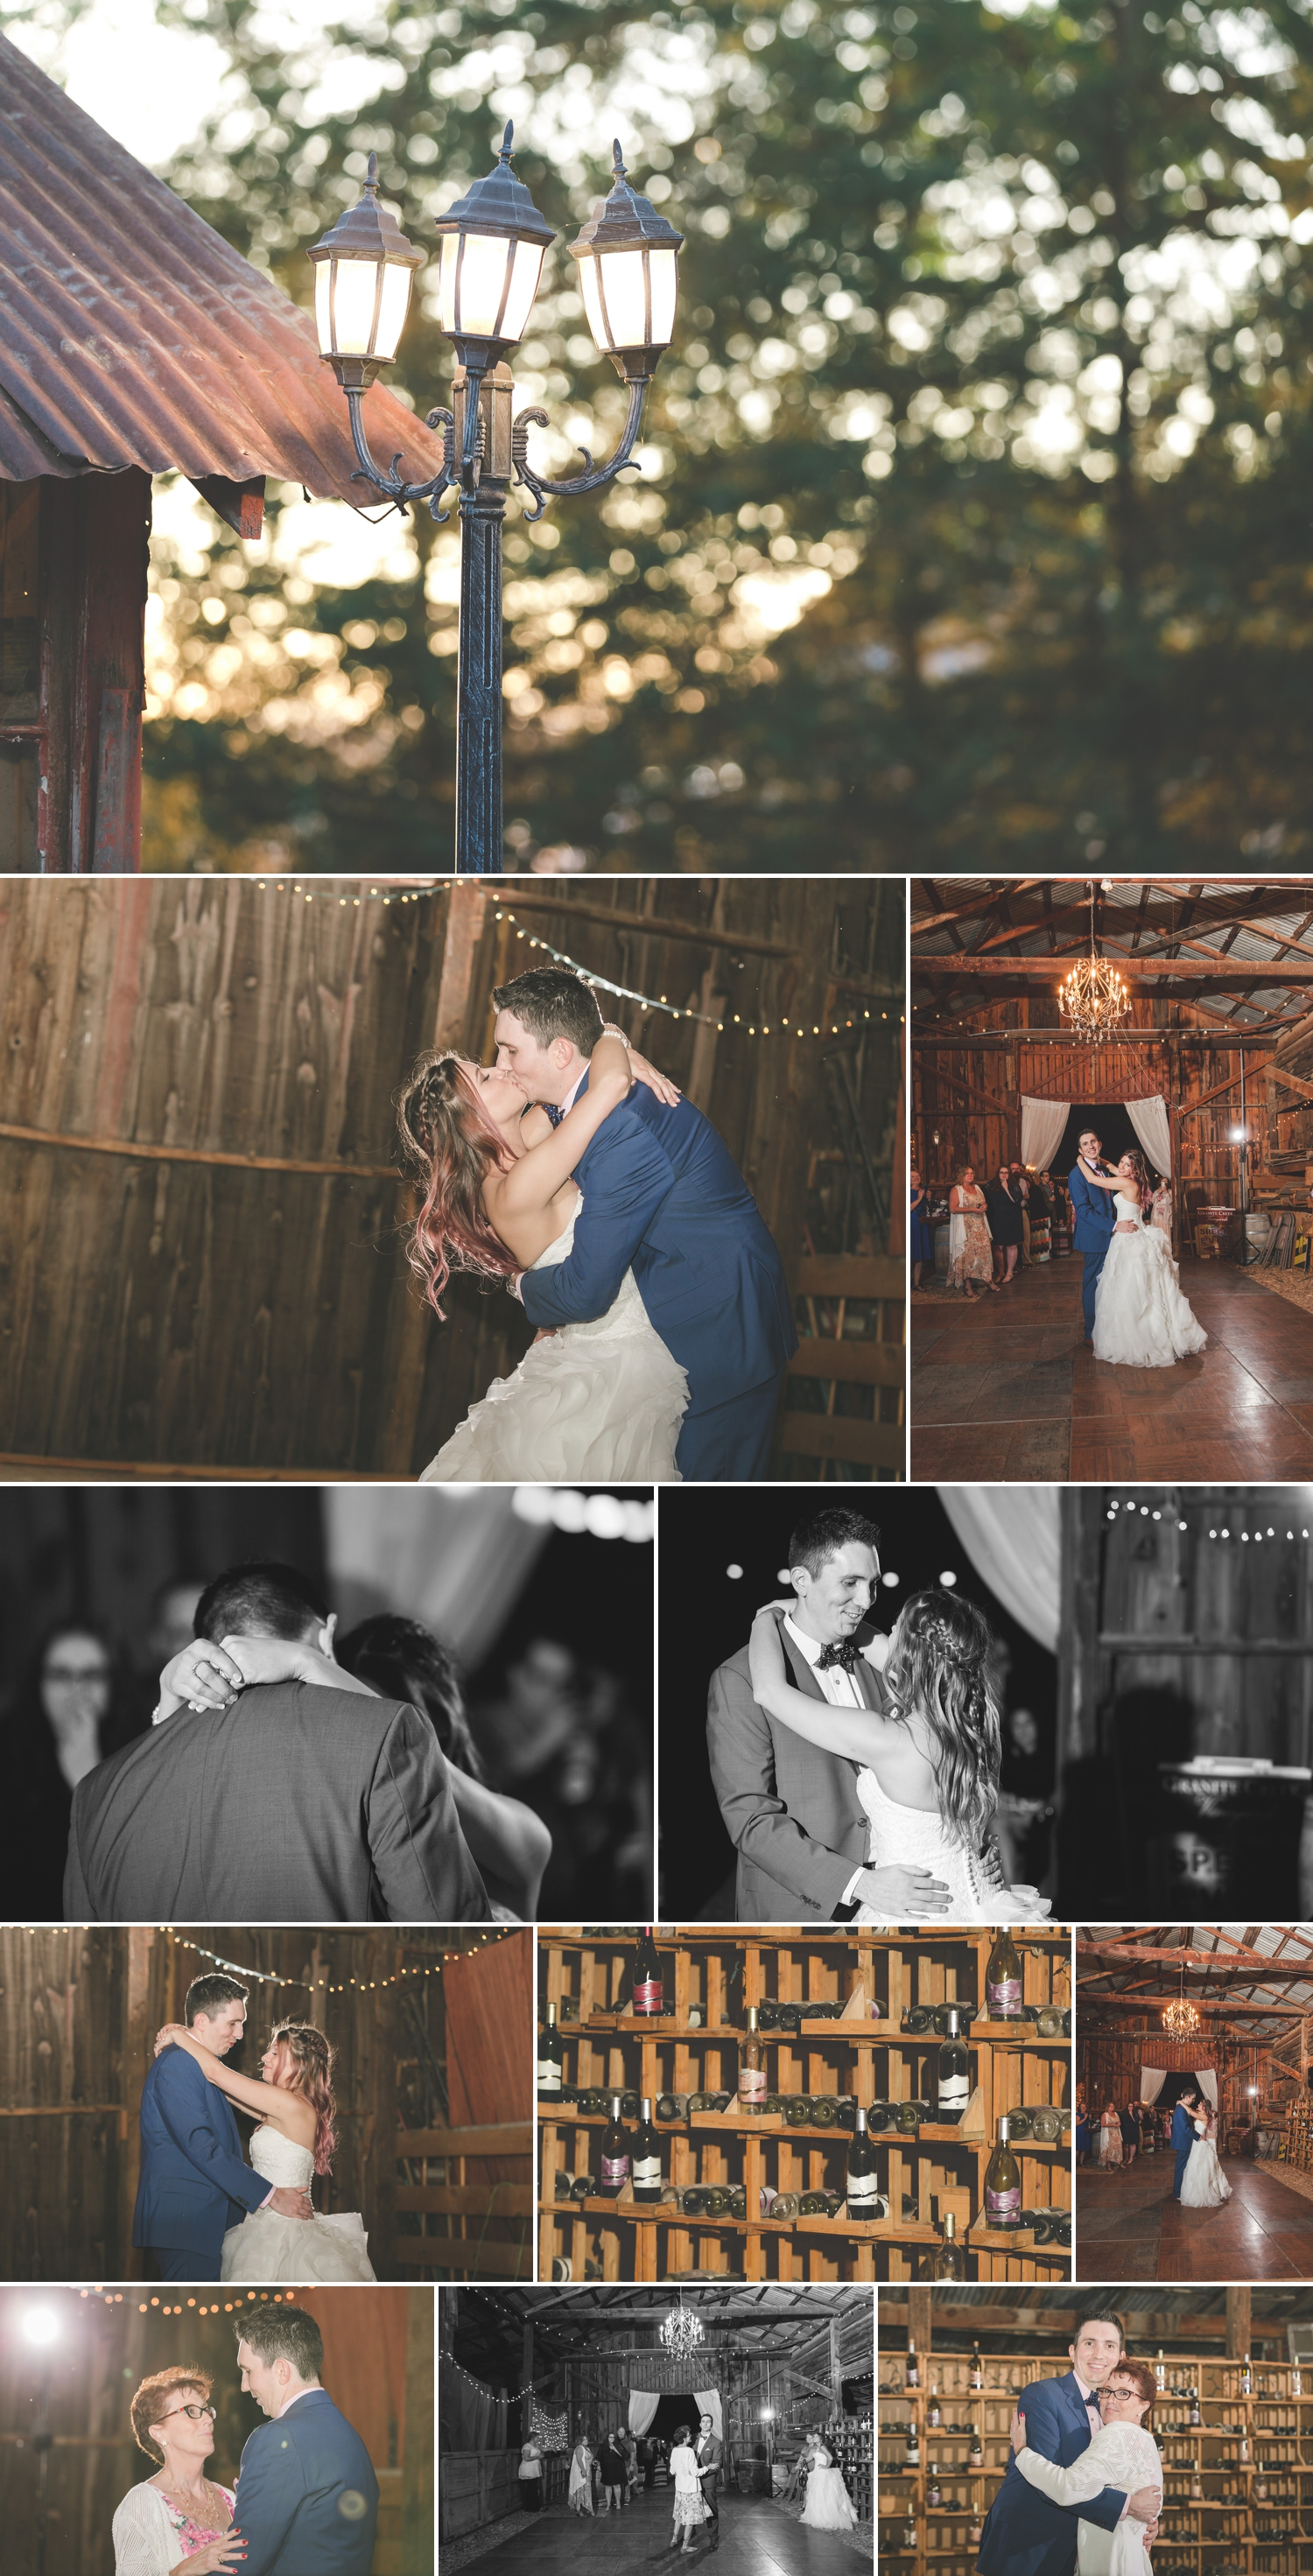 emery inman wedding 7.jpg